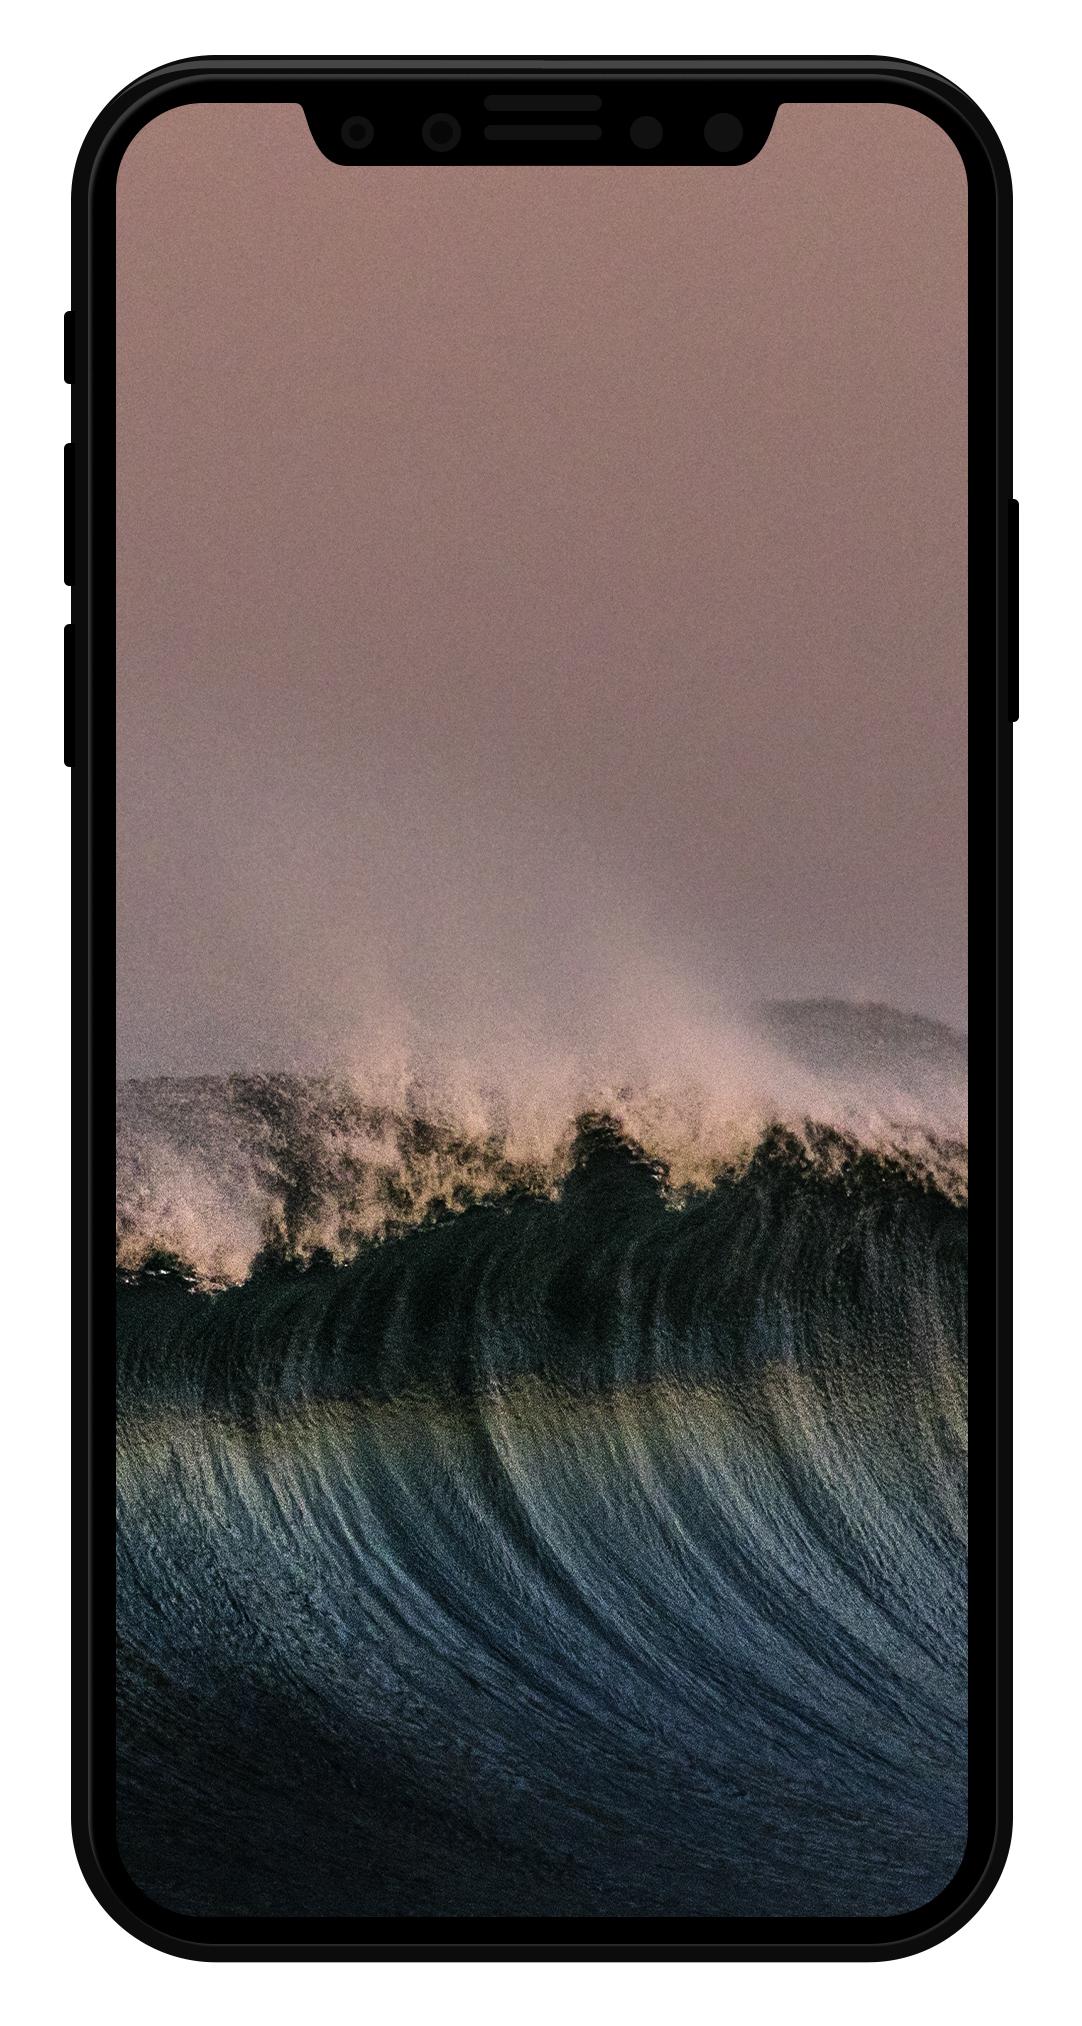 iphone-8-mockup-downloadablfeok.jpg